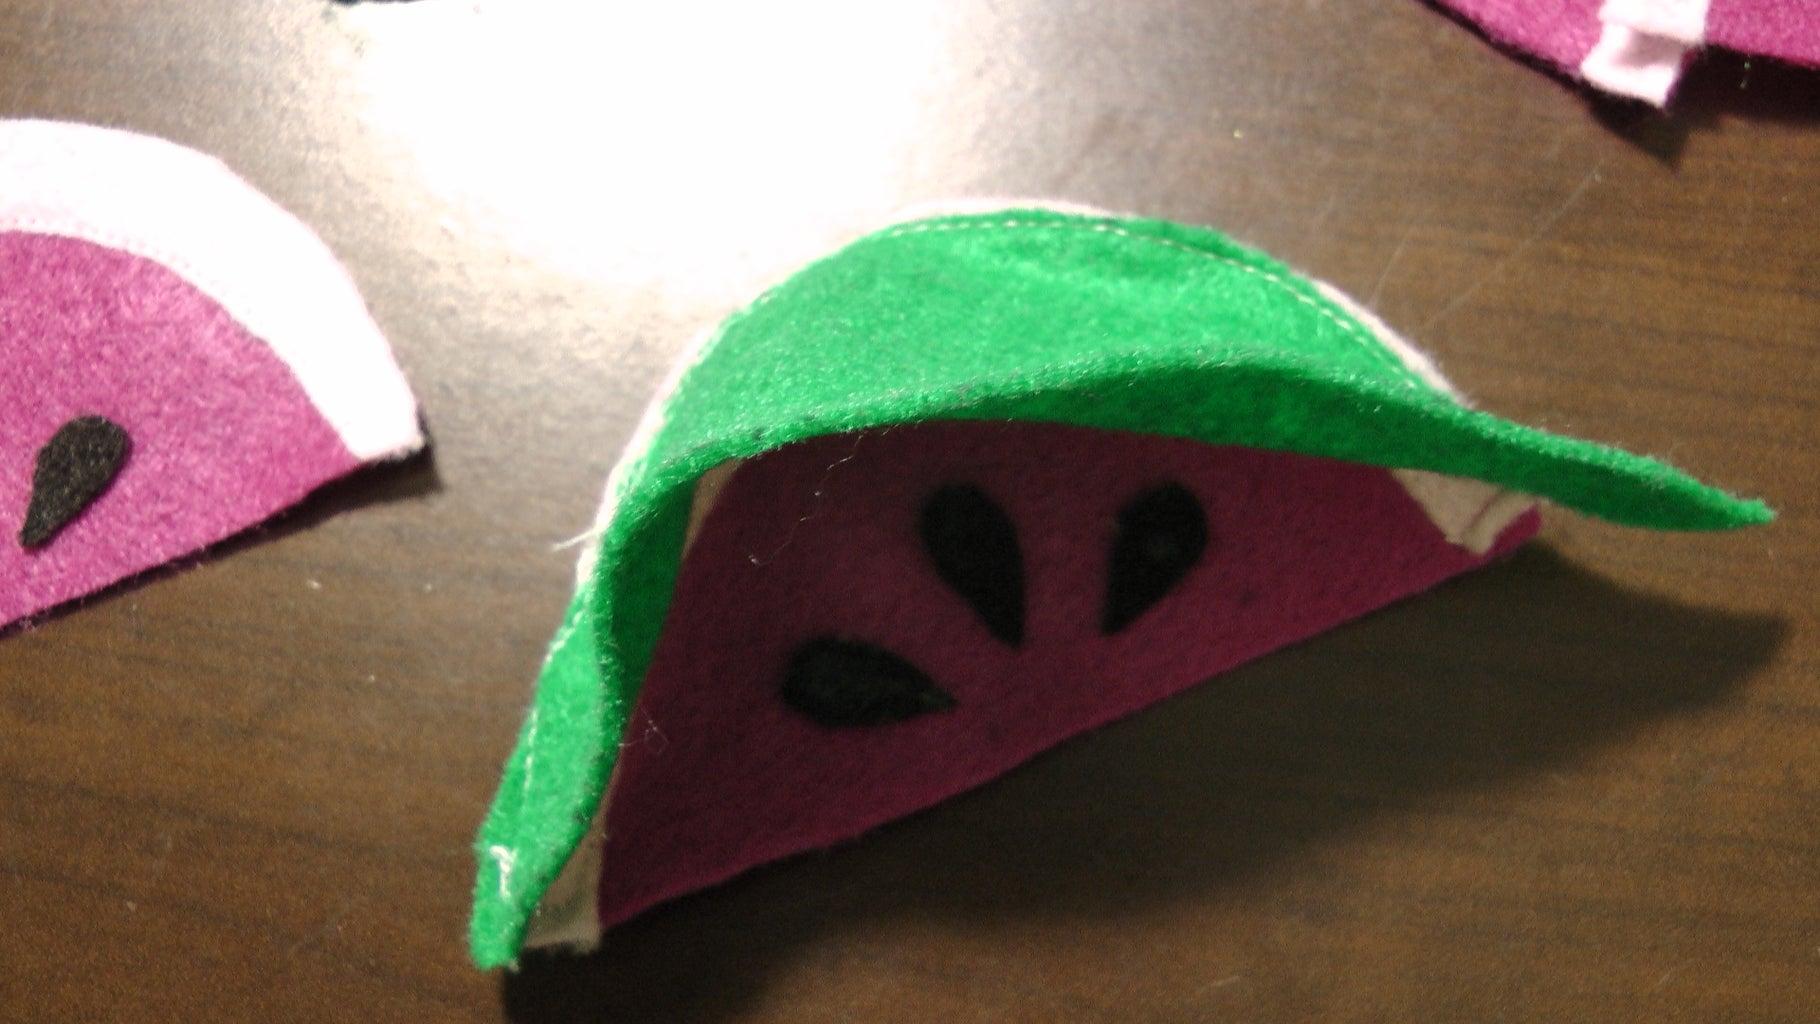 Assembling a Slice